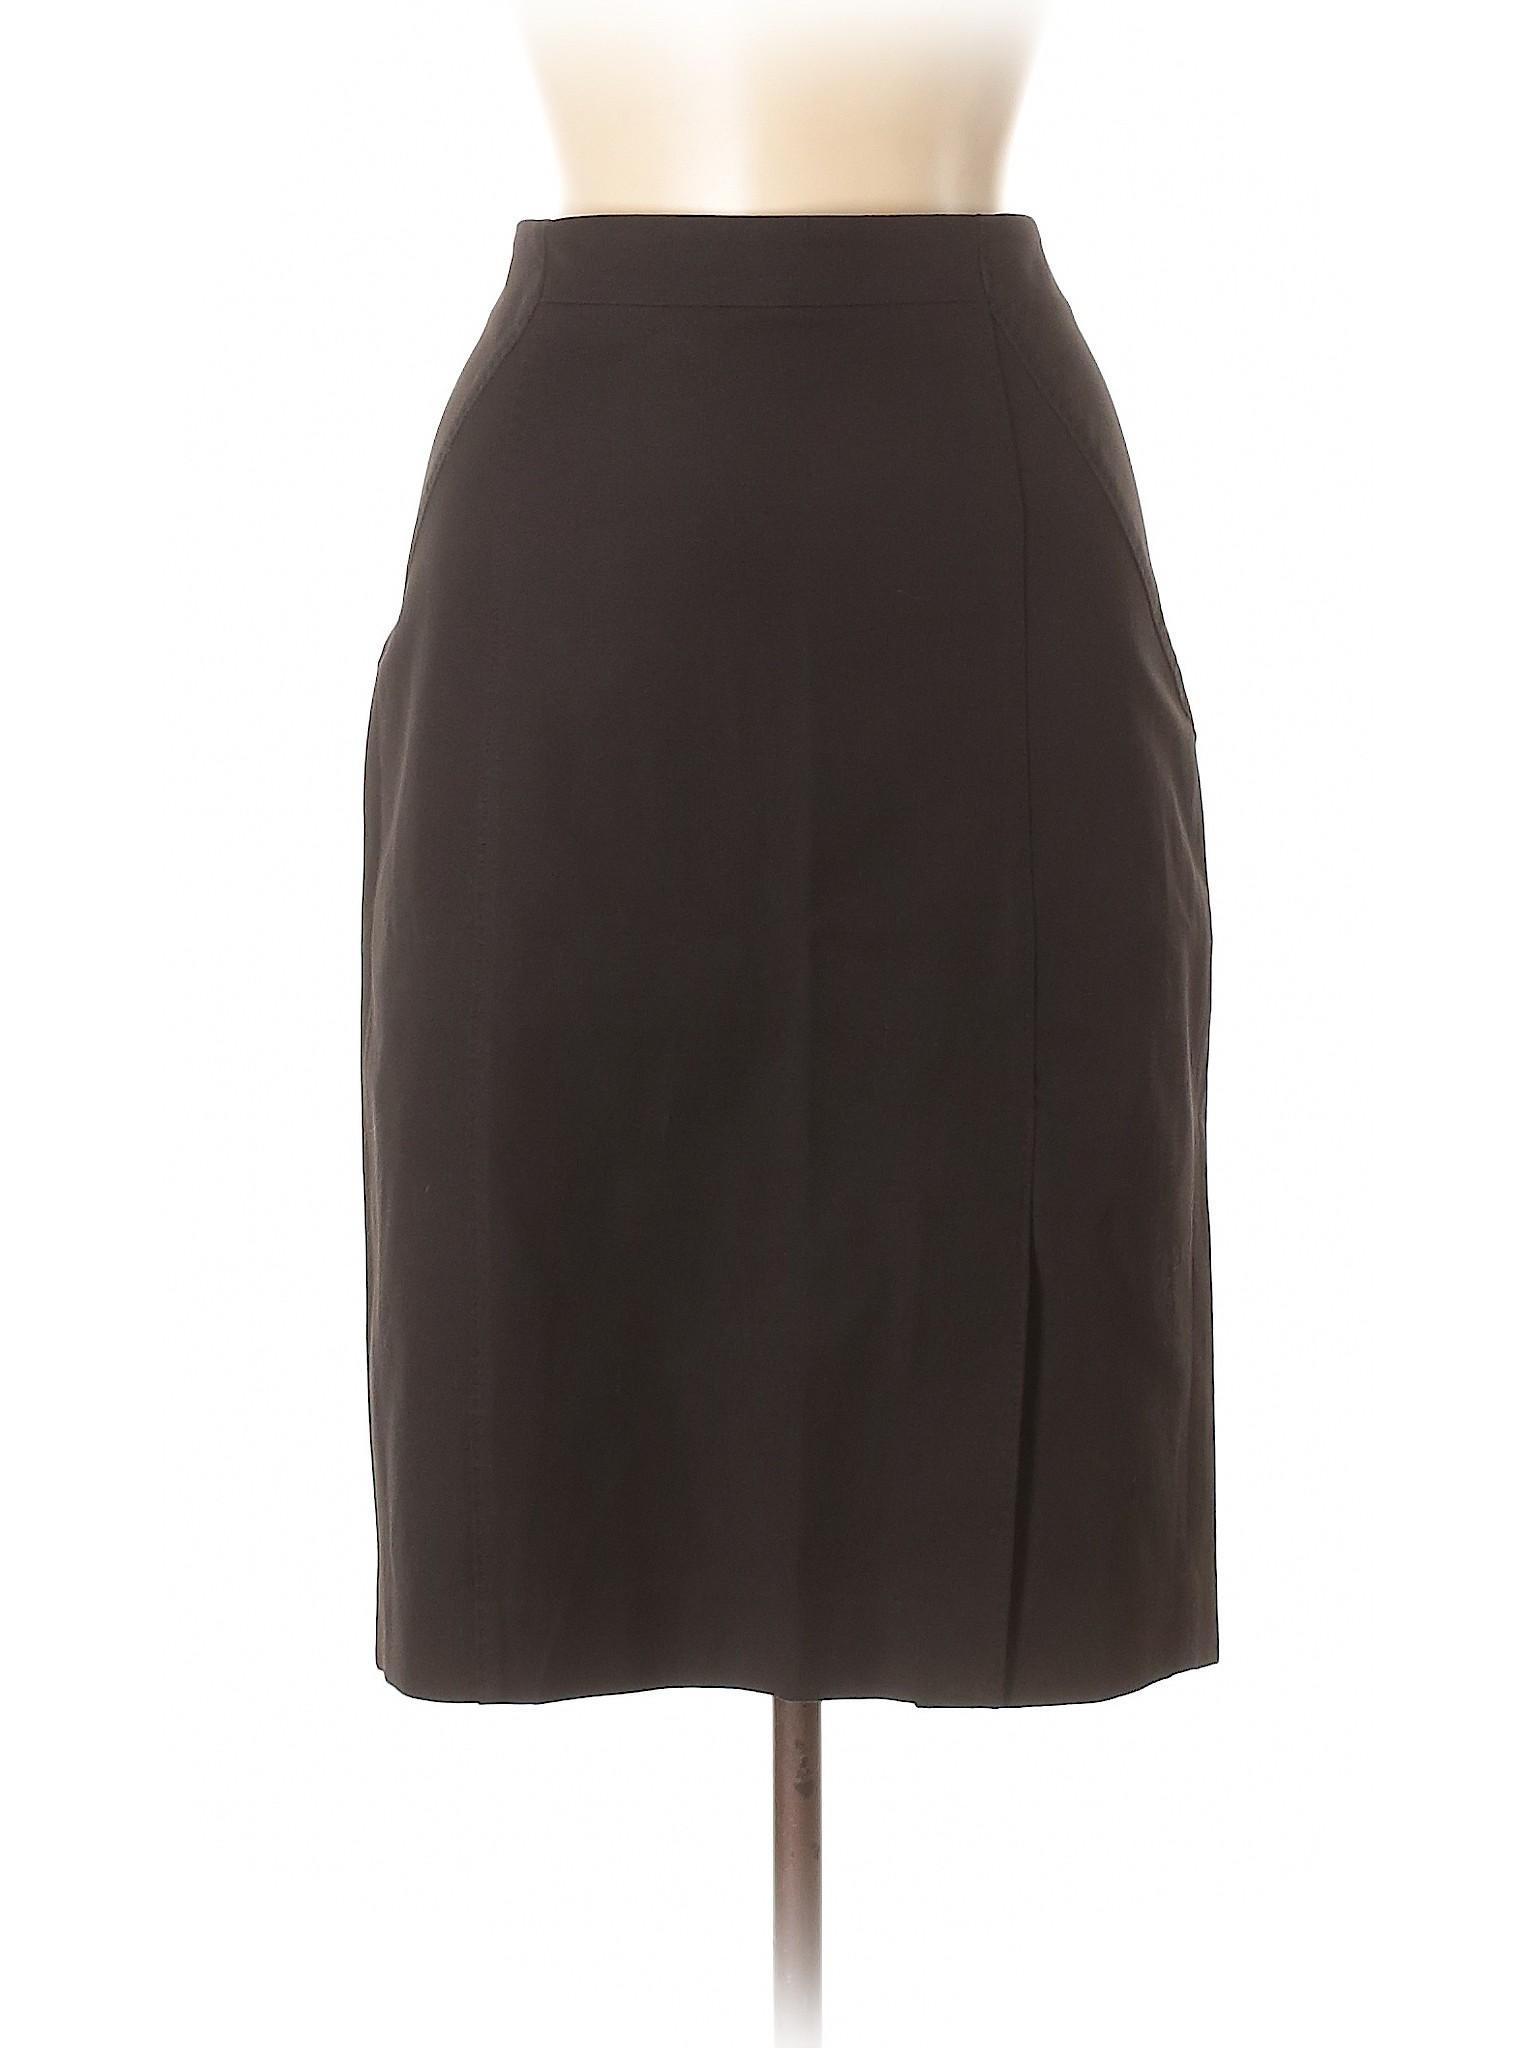 Casual Boutique Skirt Boutique Boutique Skirt Casual Casual ZOnUqPdXX